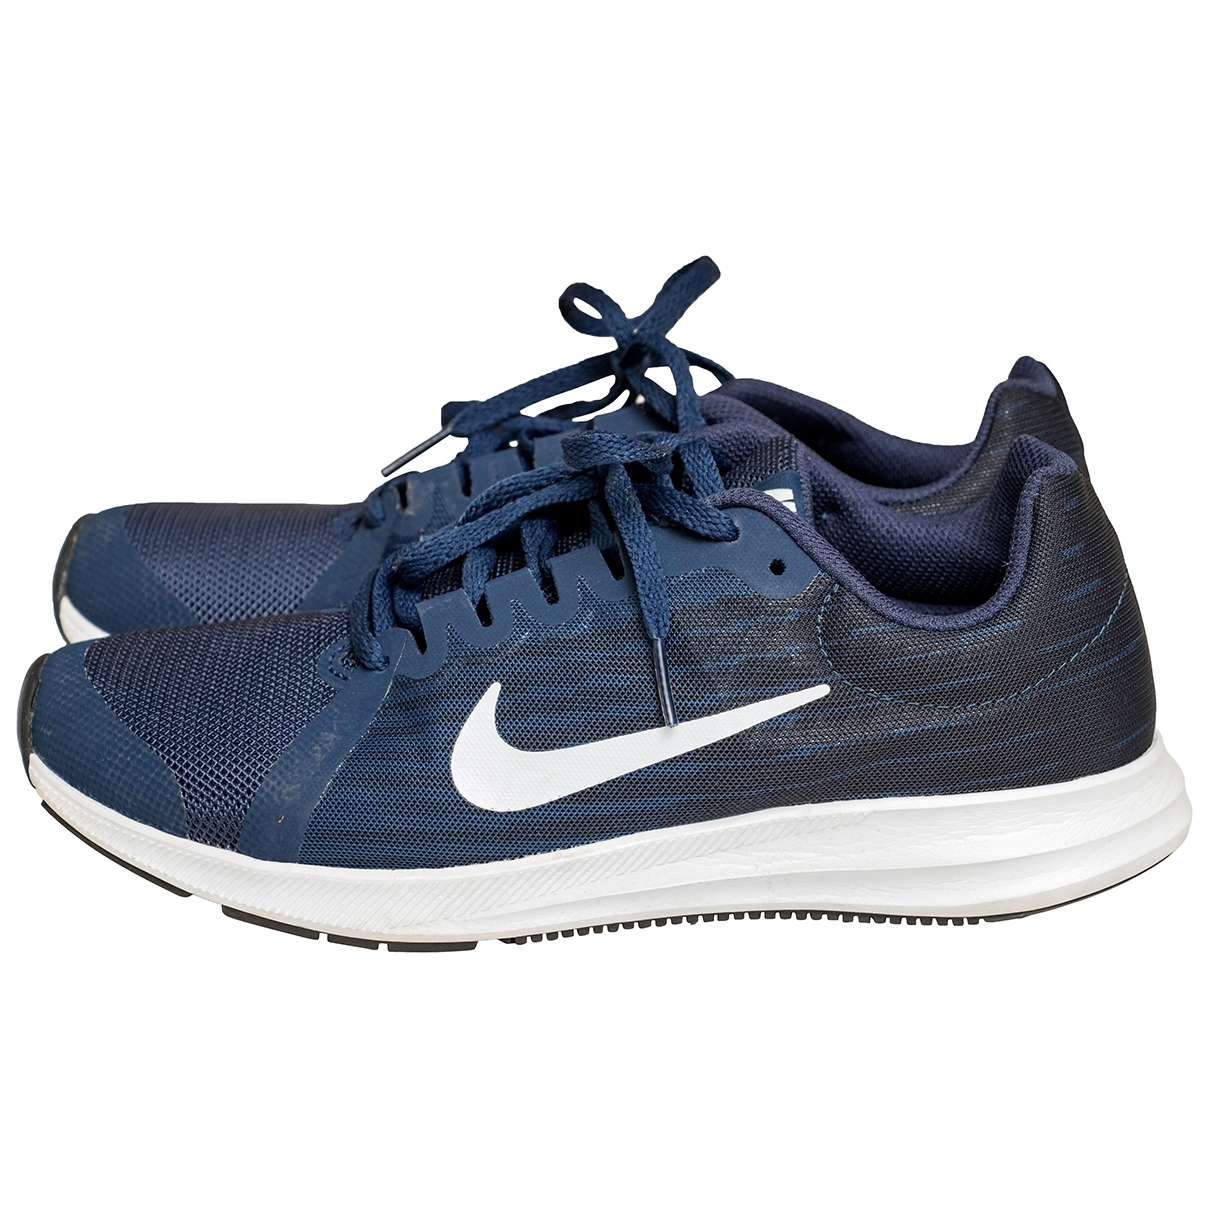 Nike - Baskets   pour femme - bleu